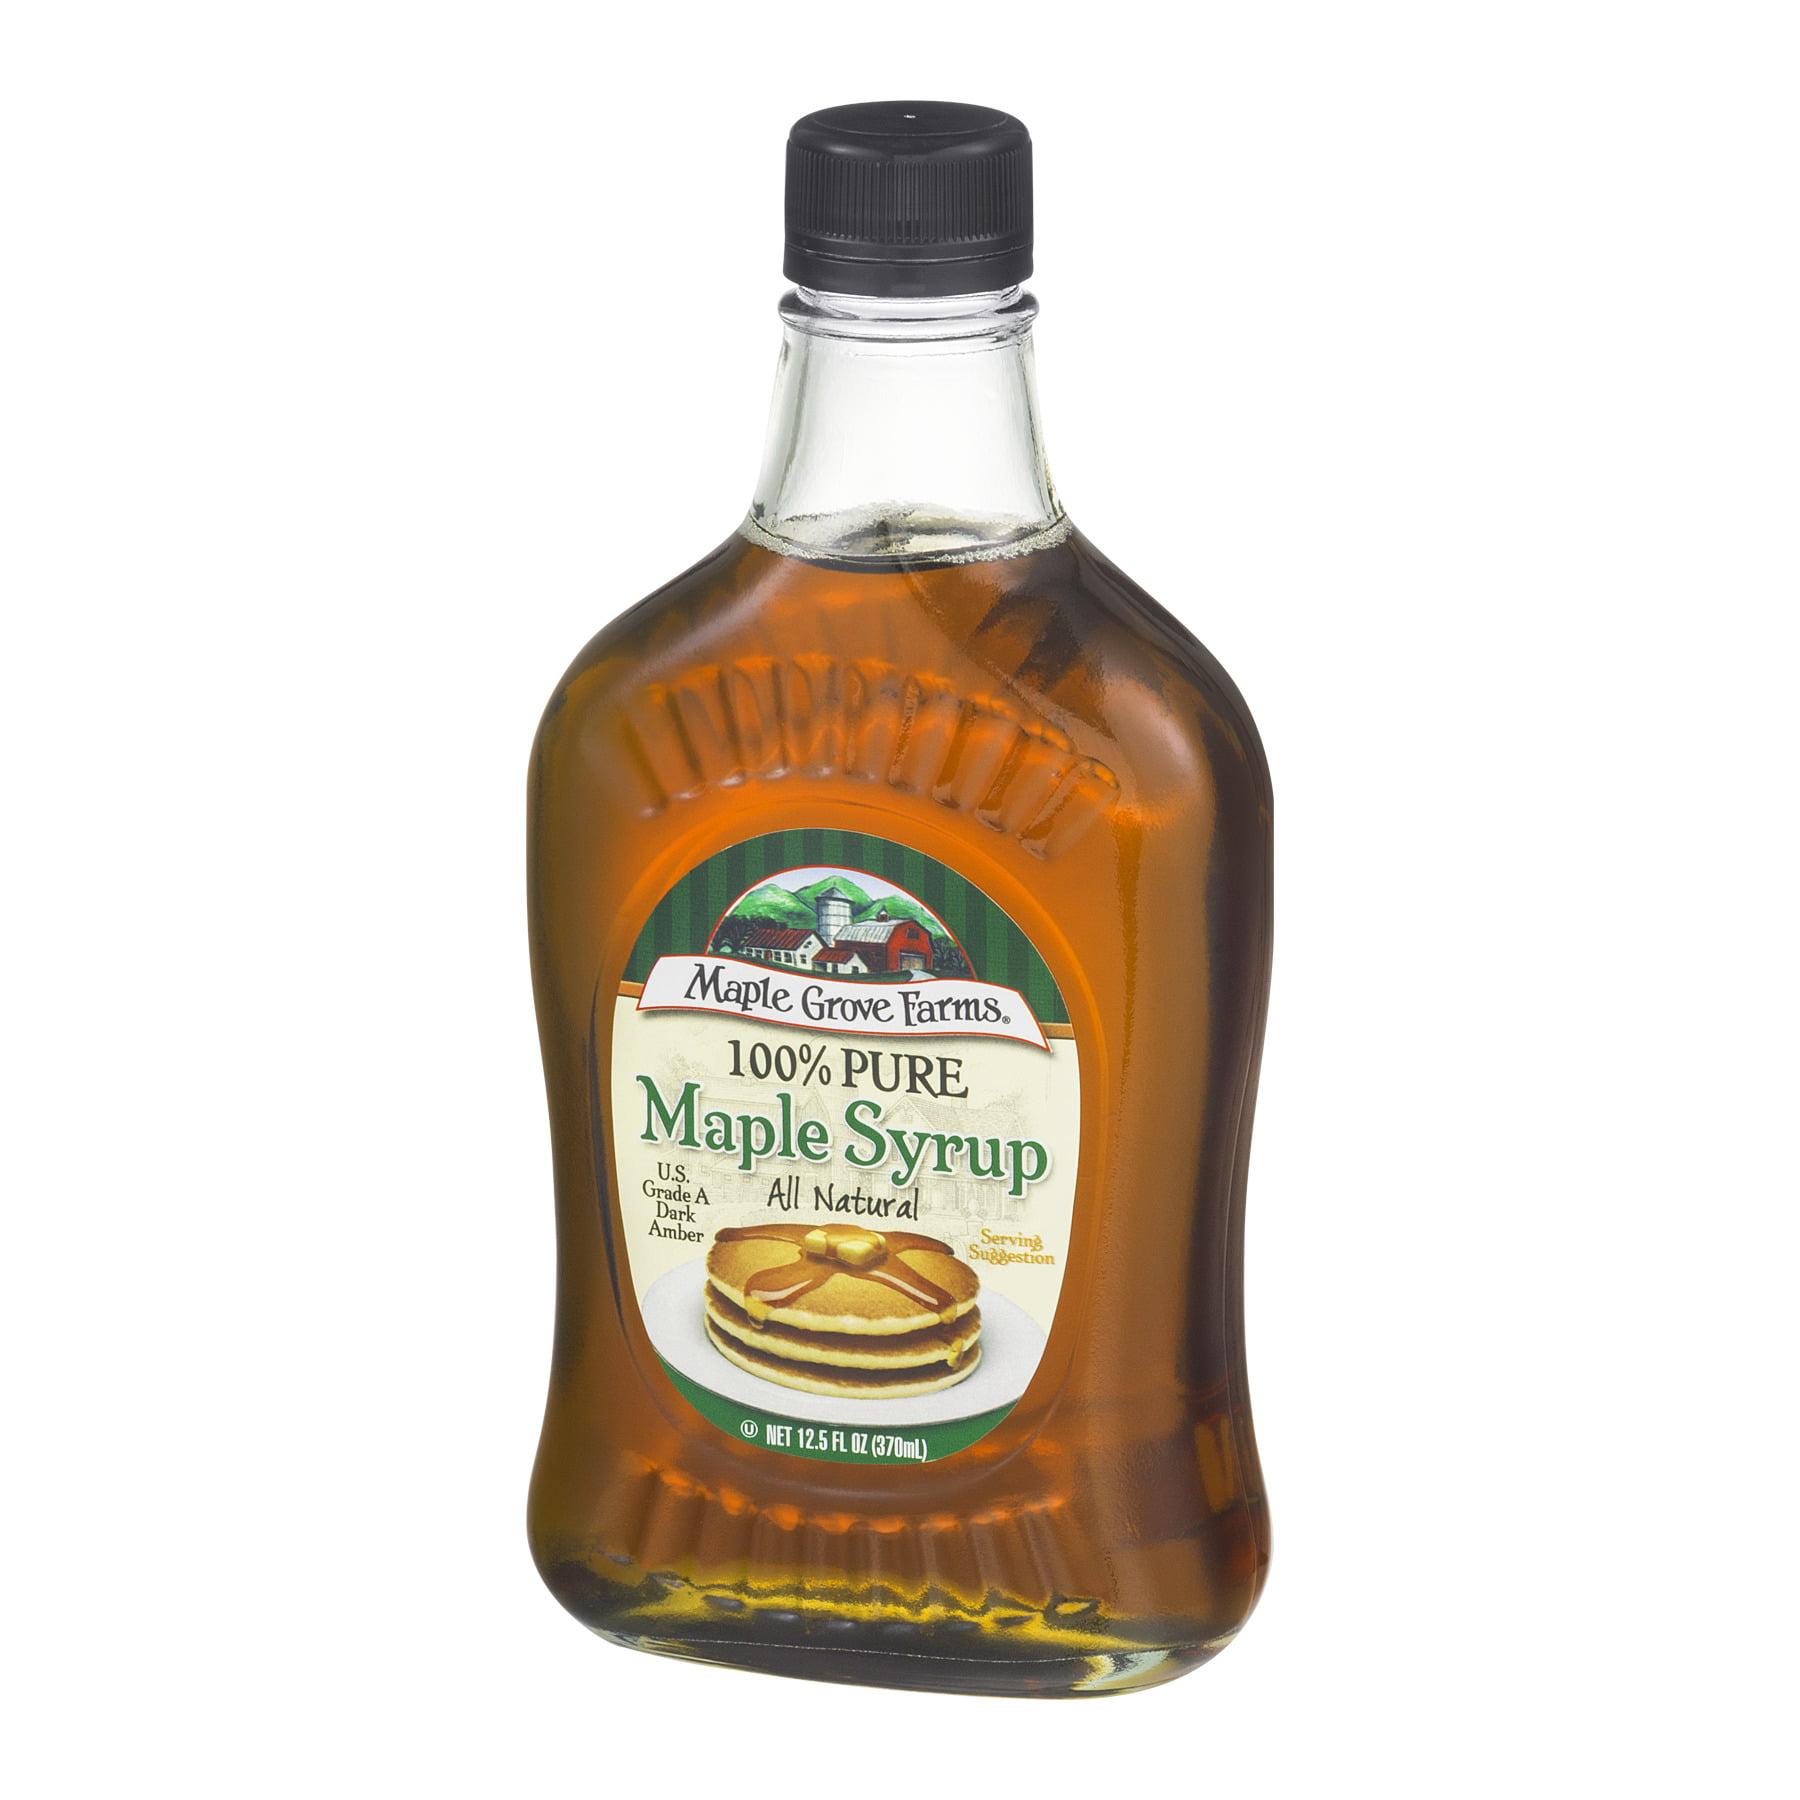 Maple Grove Farms® 100% Pure Maple Syrup 12.5 fl. oz. Bottle ...